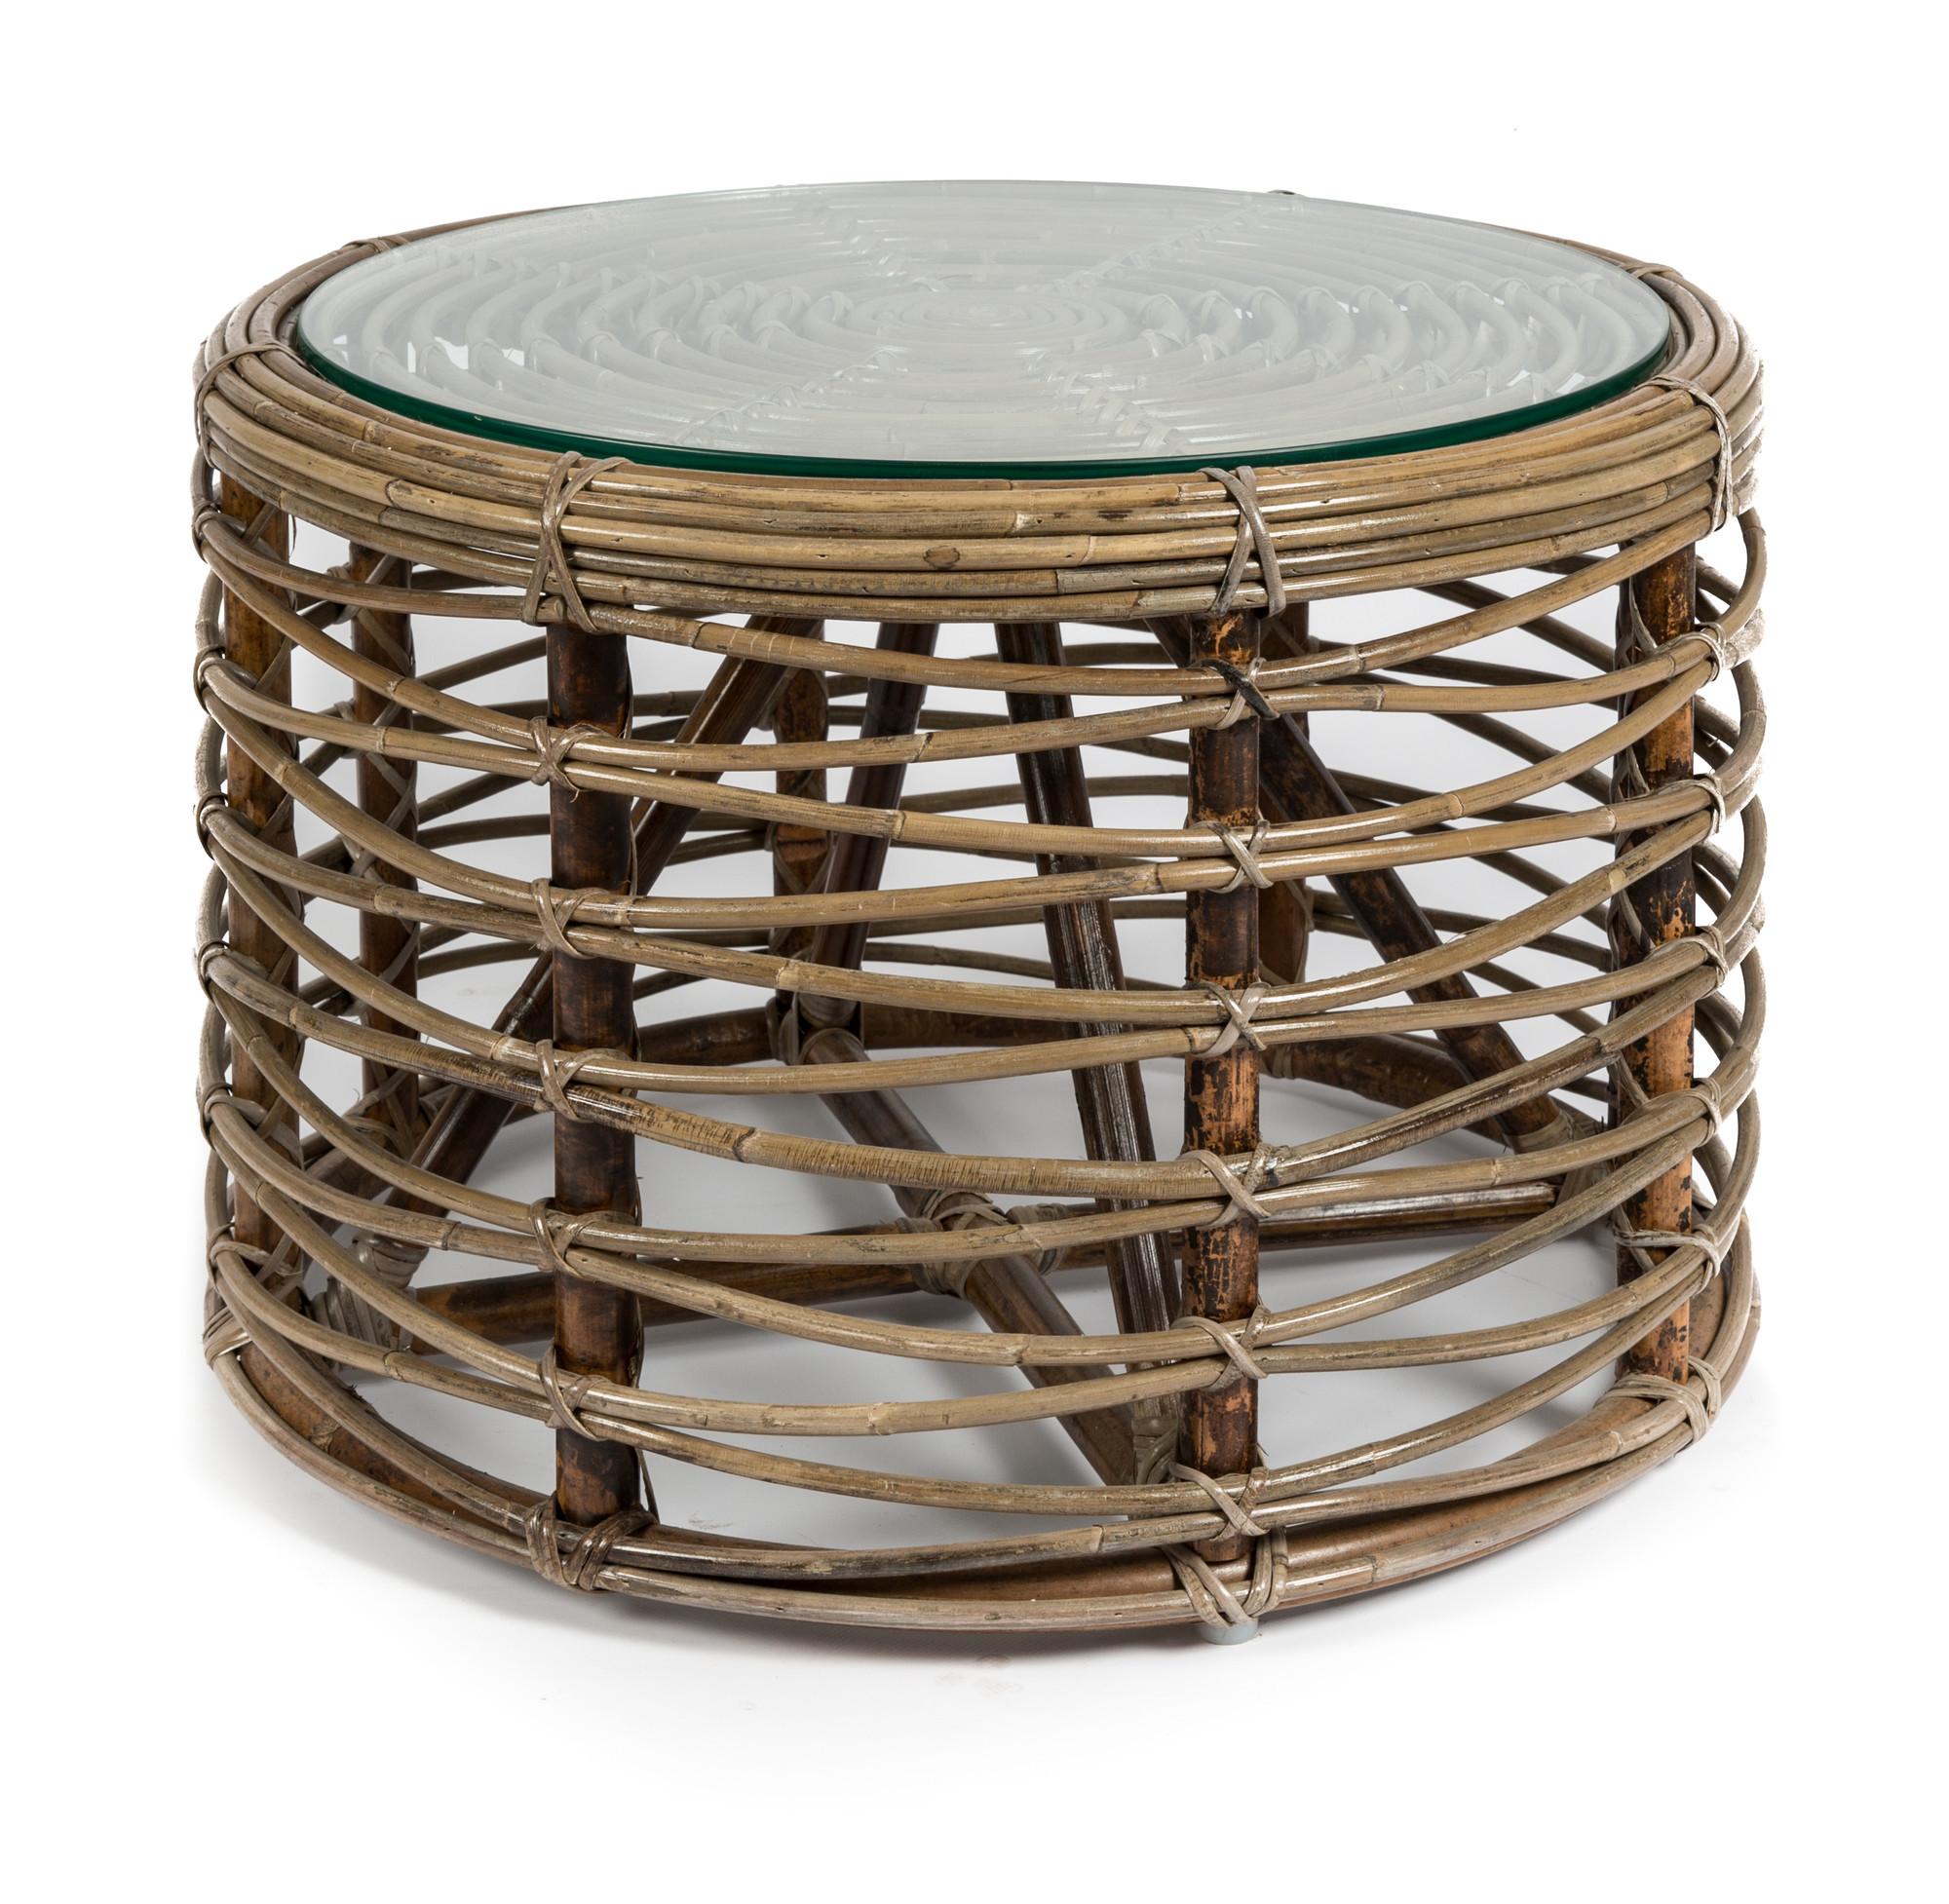 Ebay Australia Rattan Coffee Table: NEW Woven Rattan Round Coffee Table